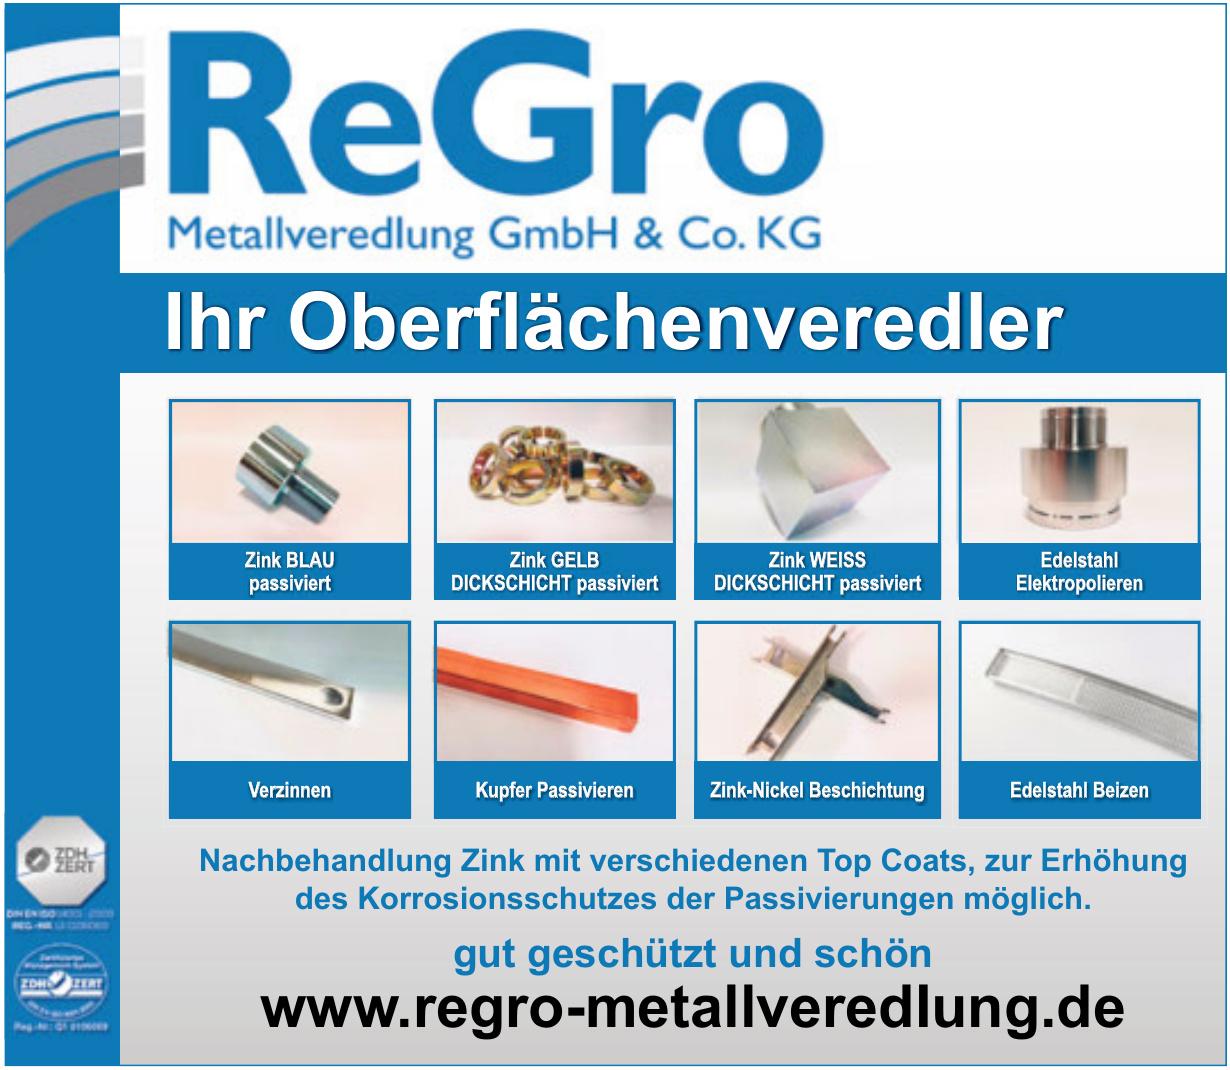 ReGro Metallveredlung GmbH & Co. KG